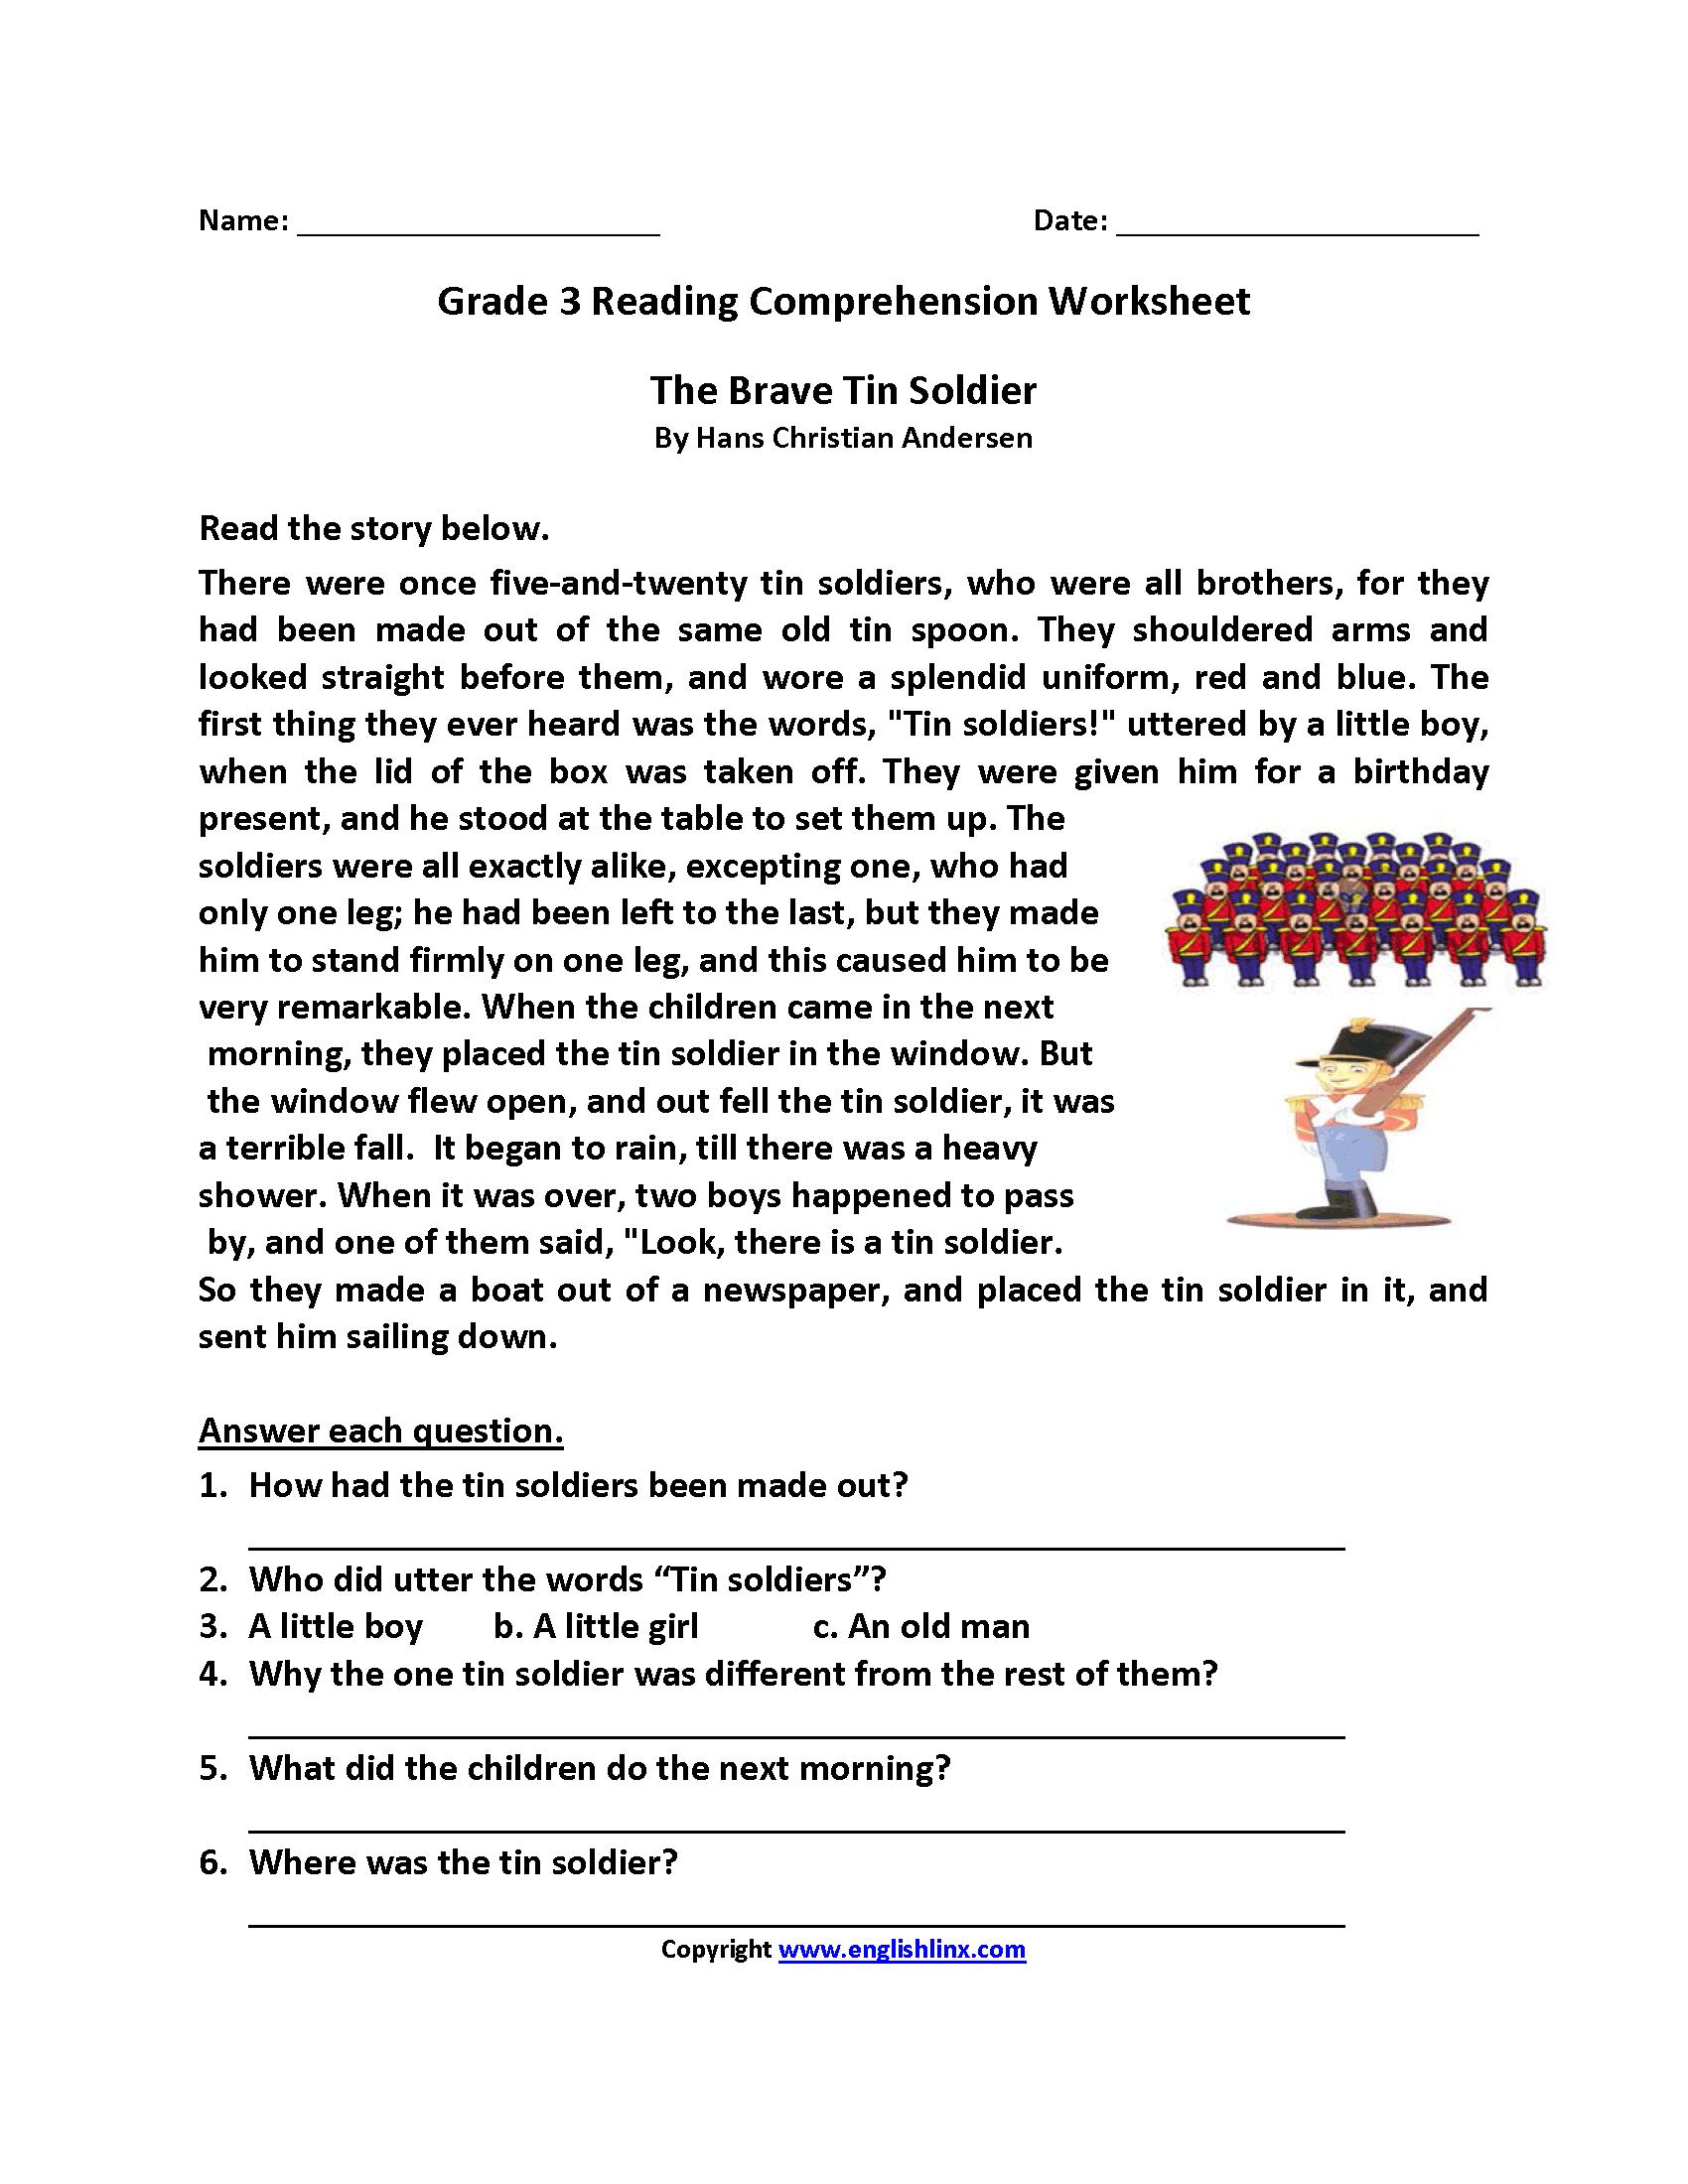 Free Printable Reading Comprehension Worksheets 3Rd Grade For Free - Third Grade Reading Worksheets Free Printable